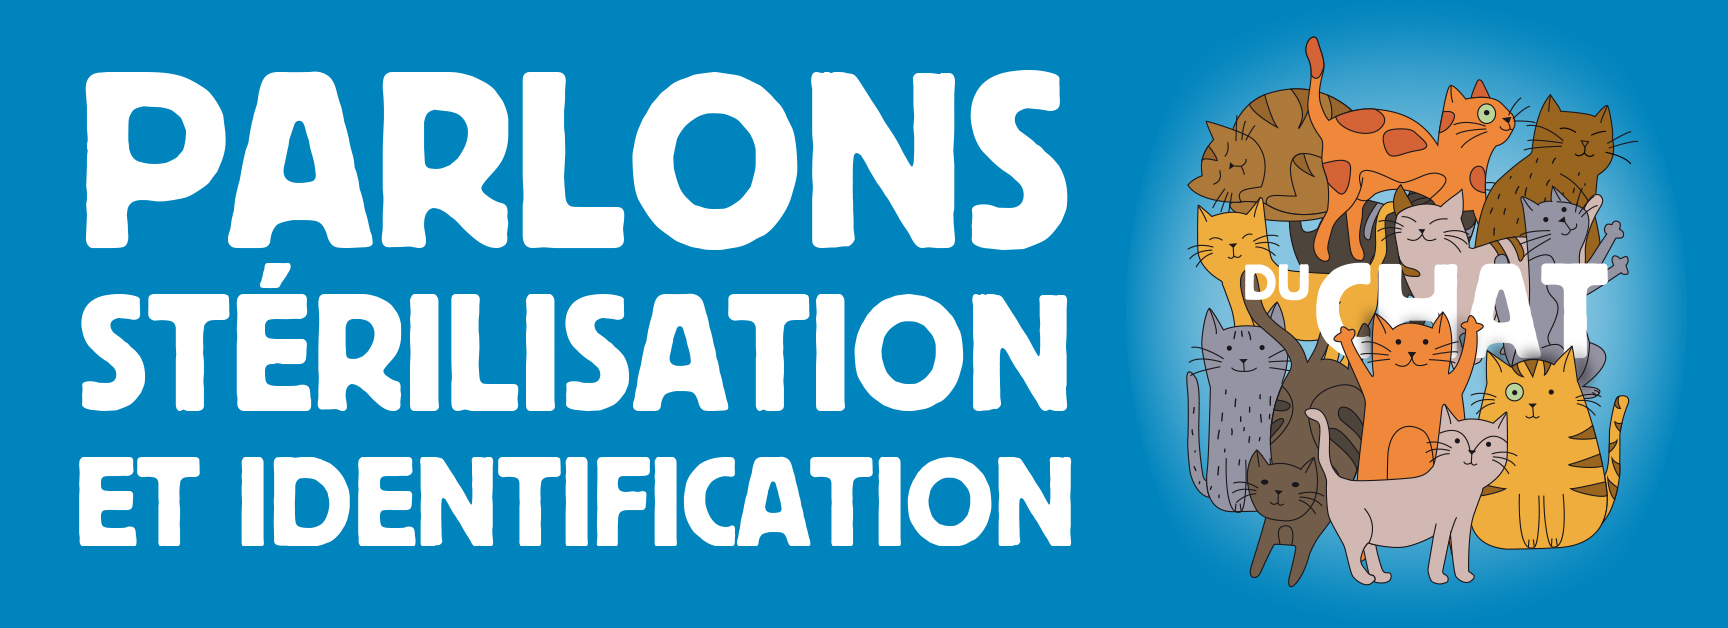 Parlons-Stérilisation-Identification